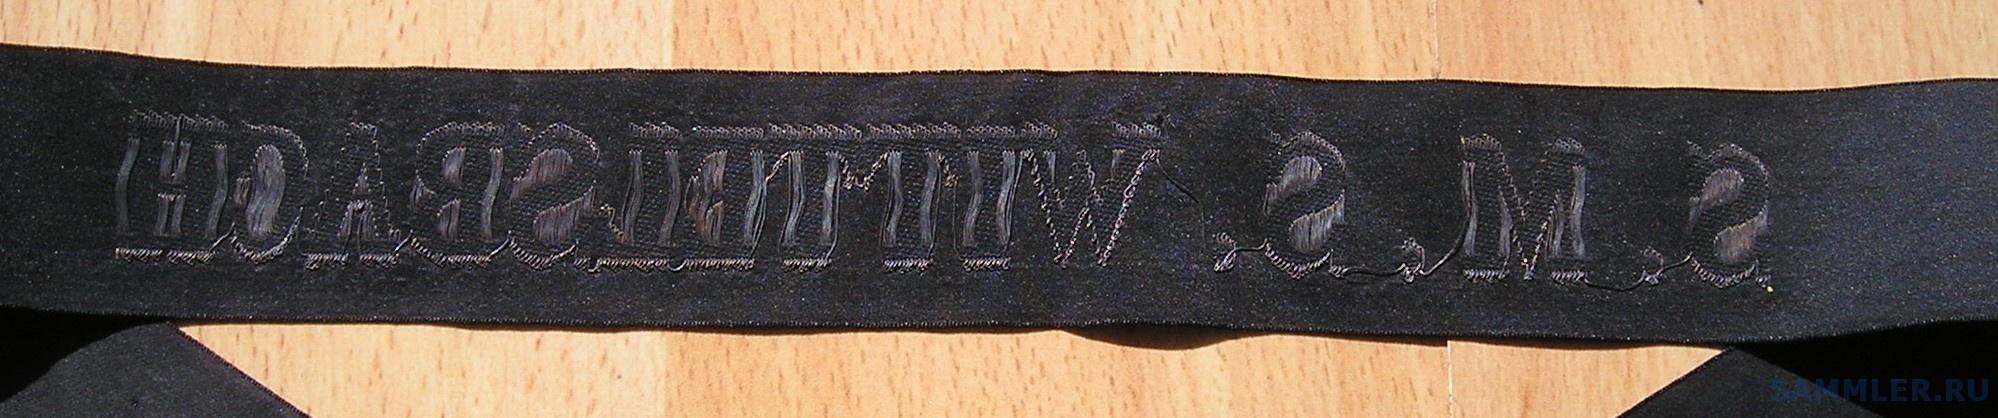 P1011549.JPG